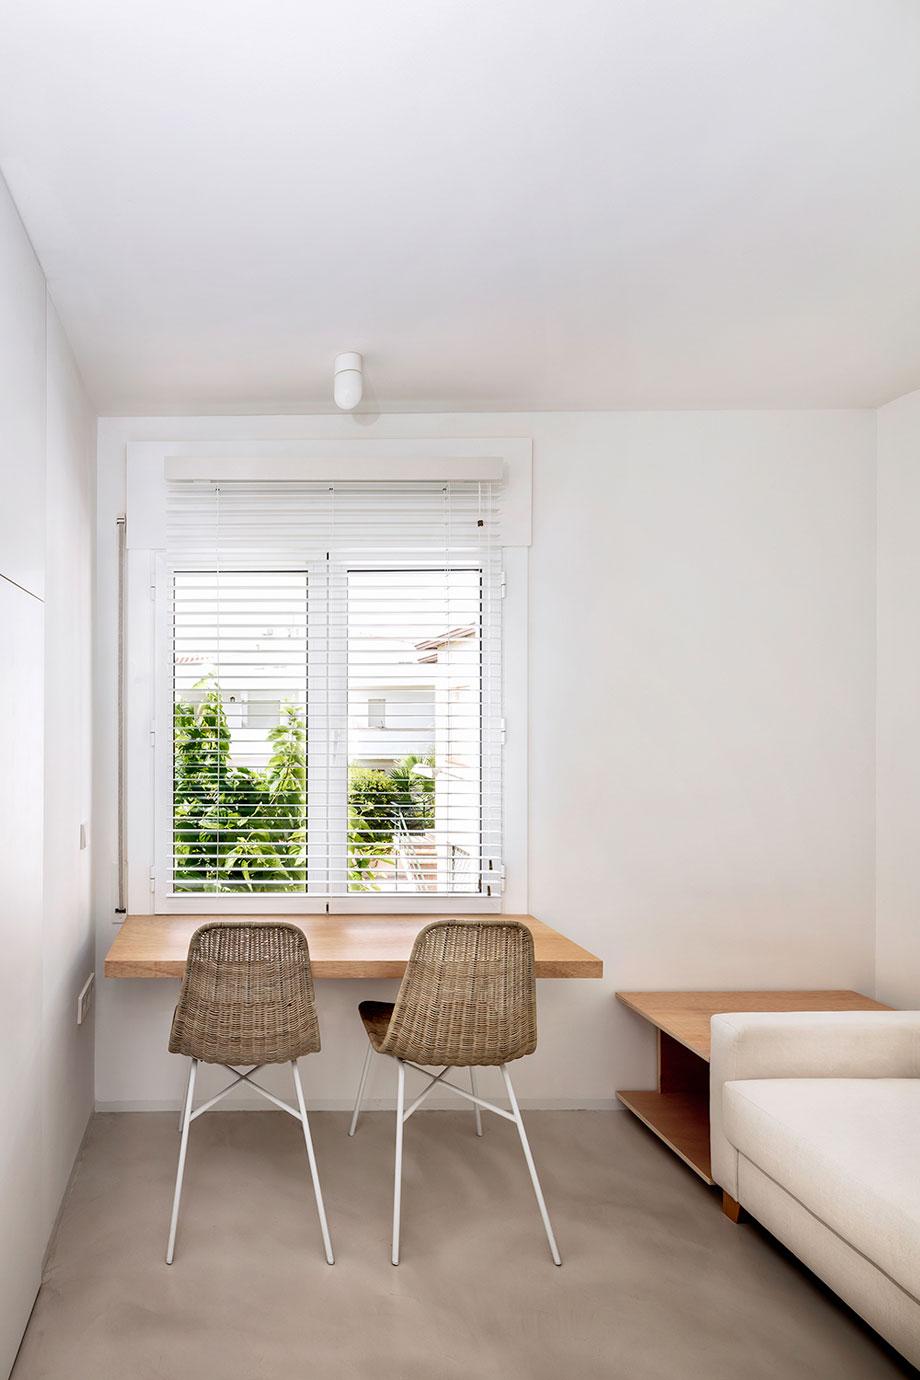 apartamento en altafulla de agusti costa (11) - foto david cardelus